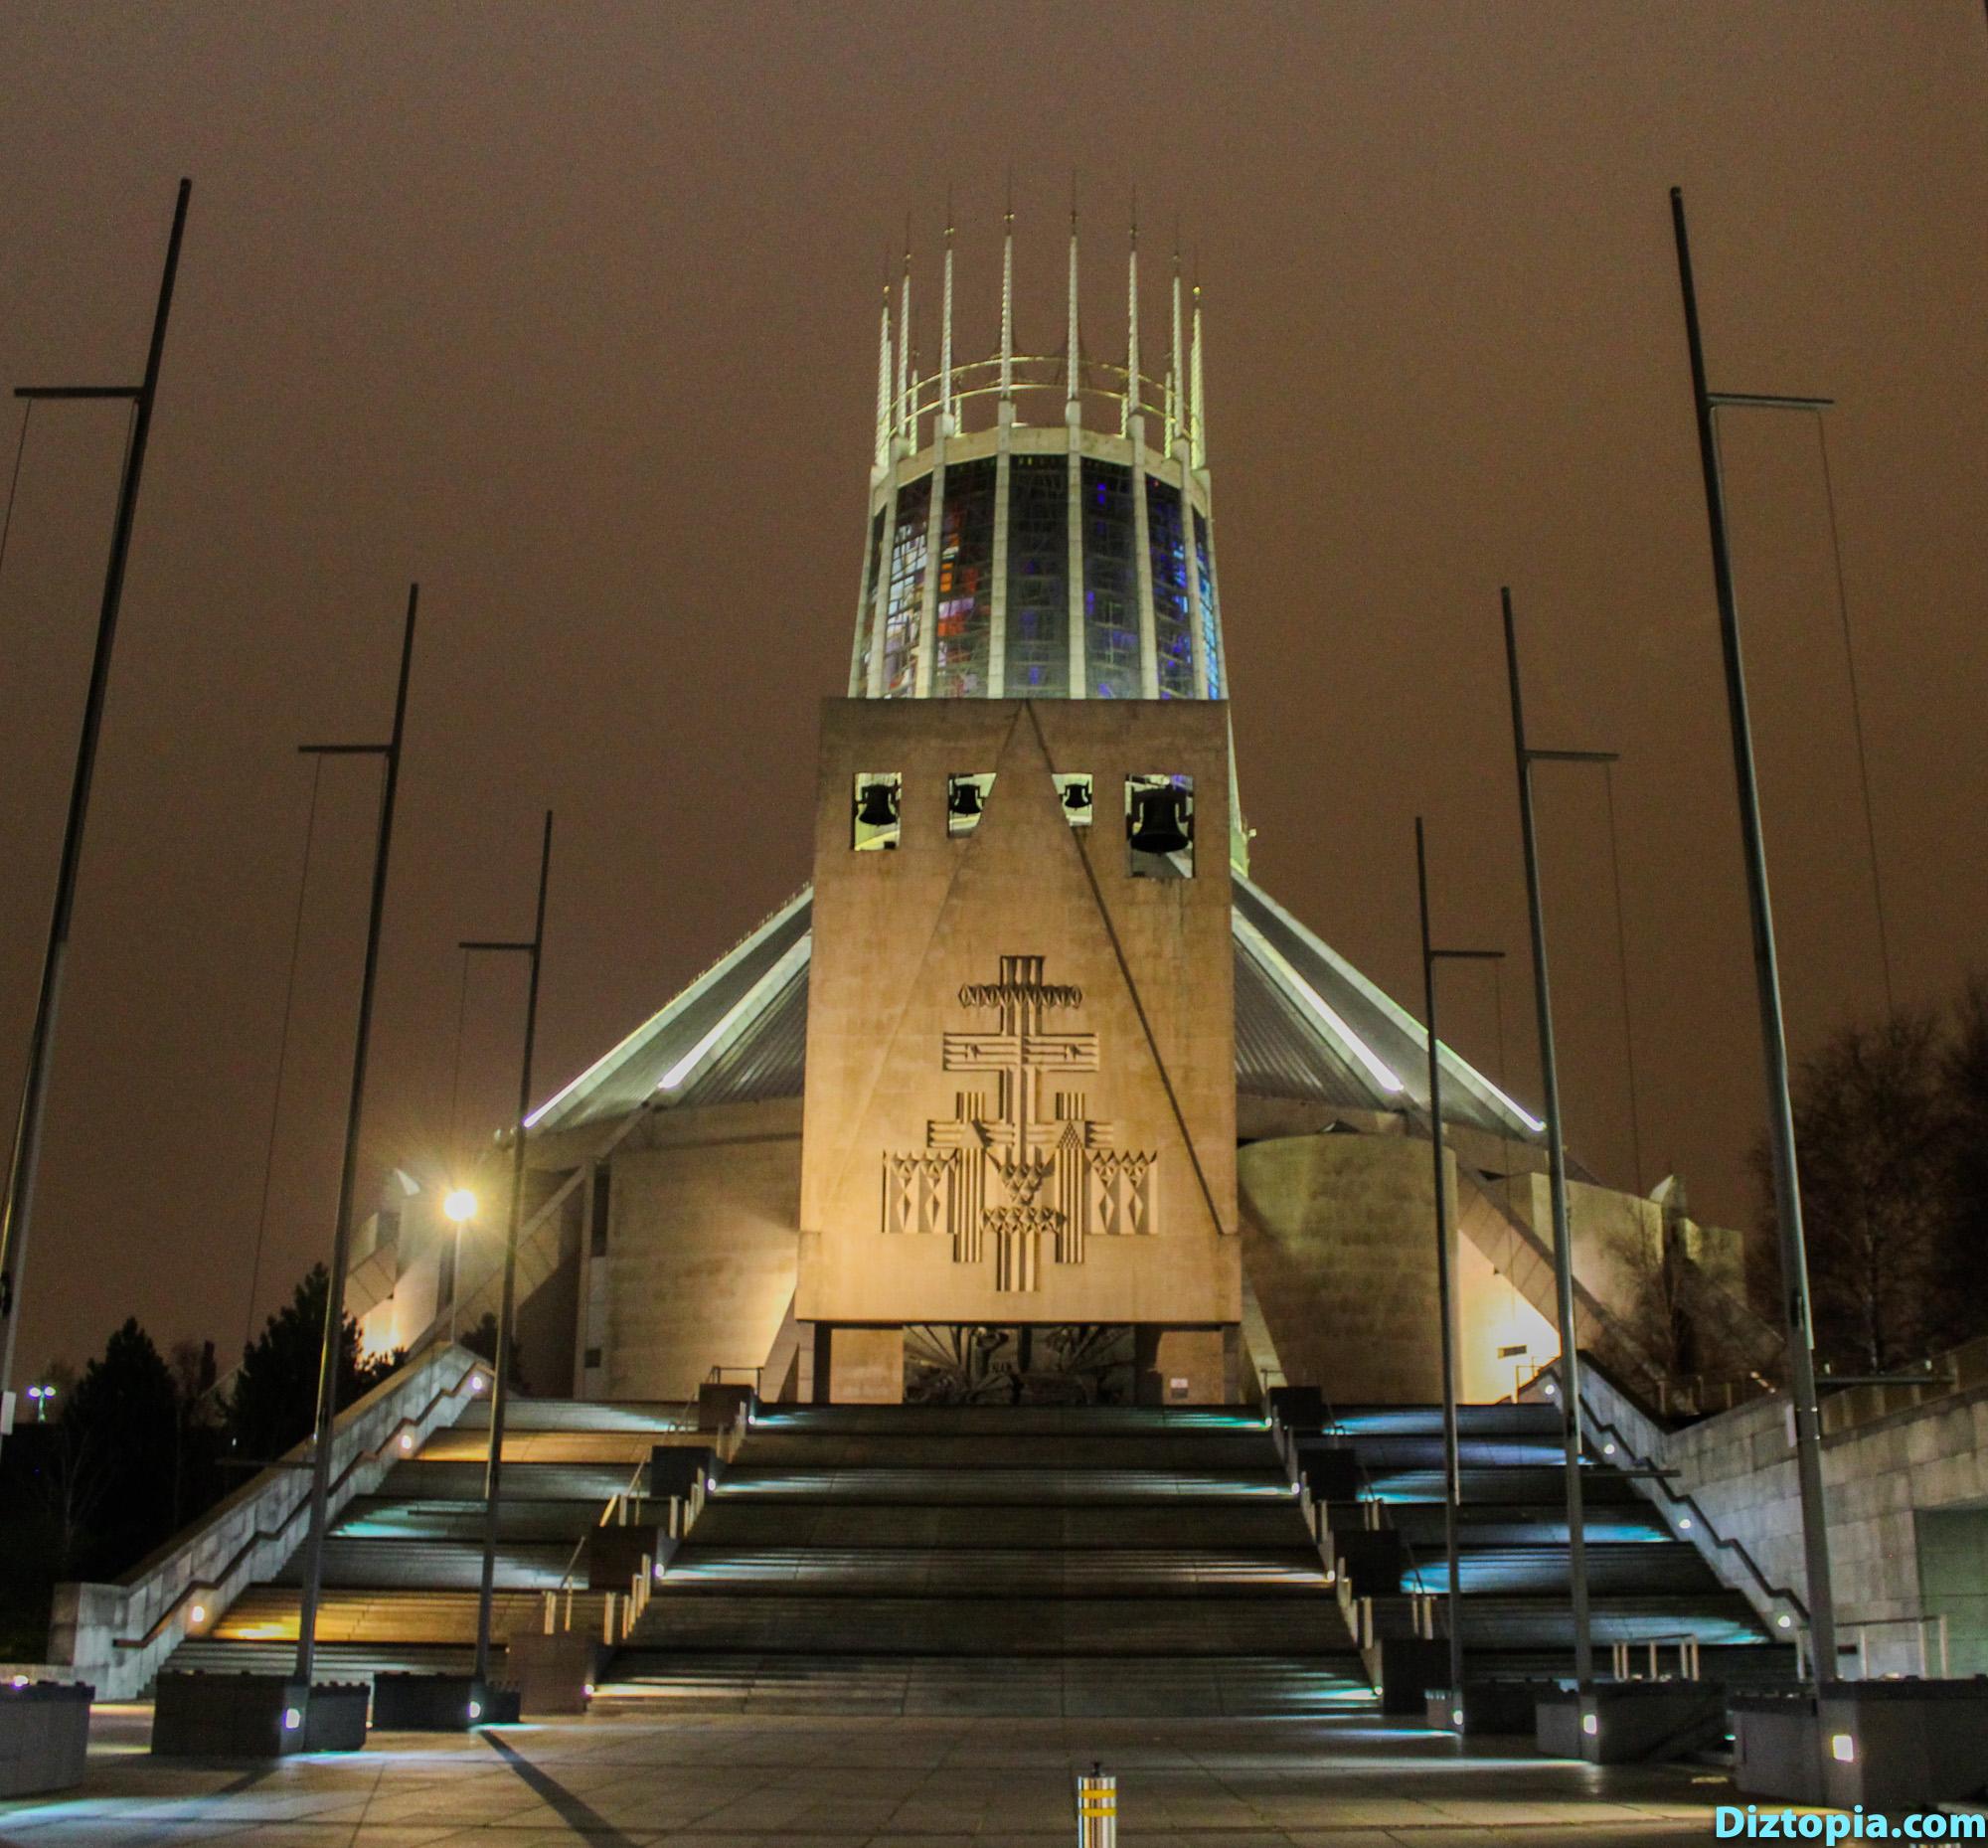 Liverpool-City-UK-Diztopia-Dizma-Dahl-Photography-2017-42-Centre-Heart-Night-Metropolitan-Cathedral